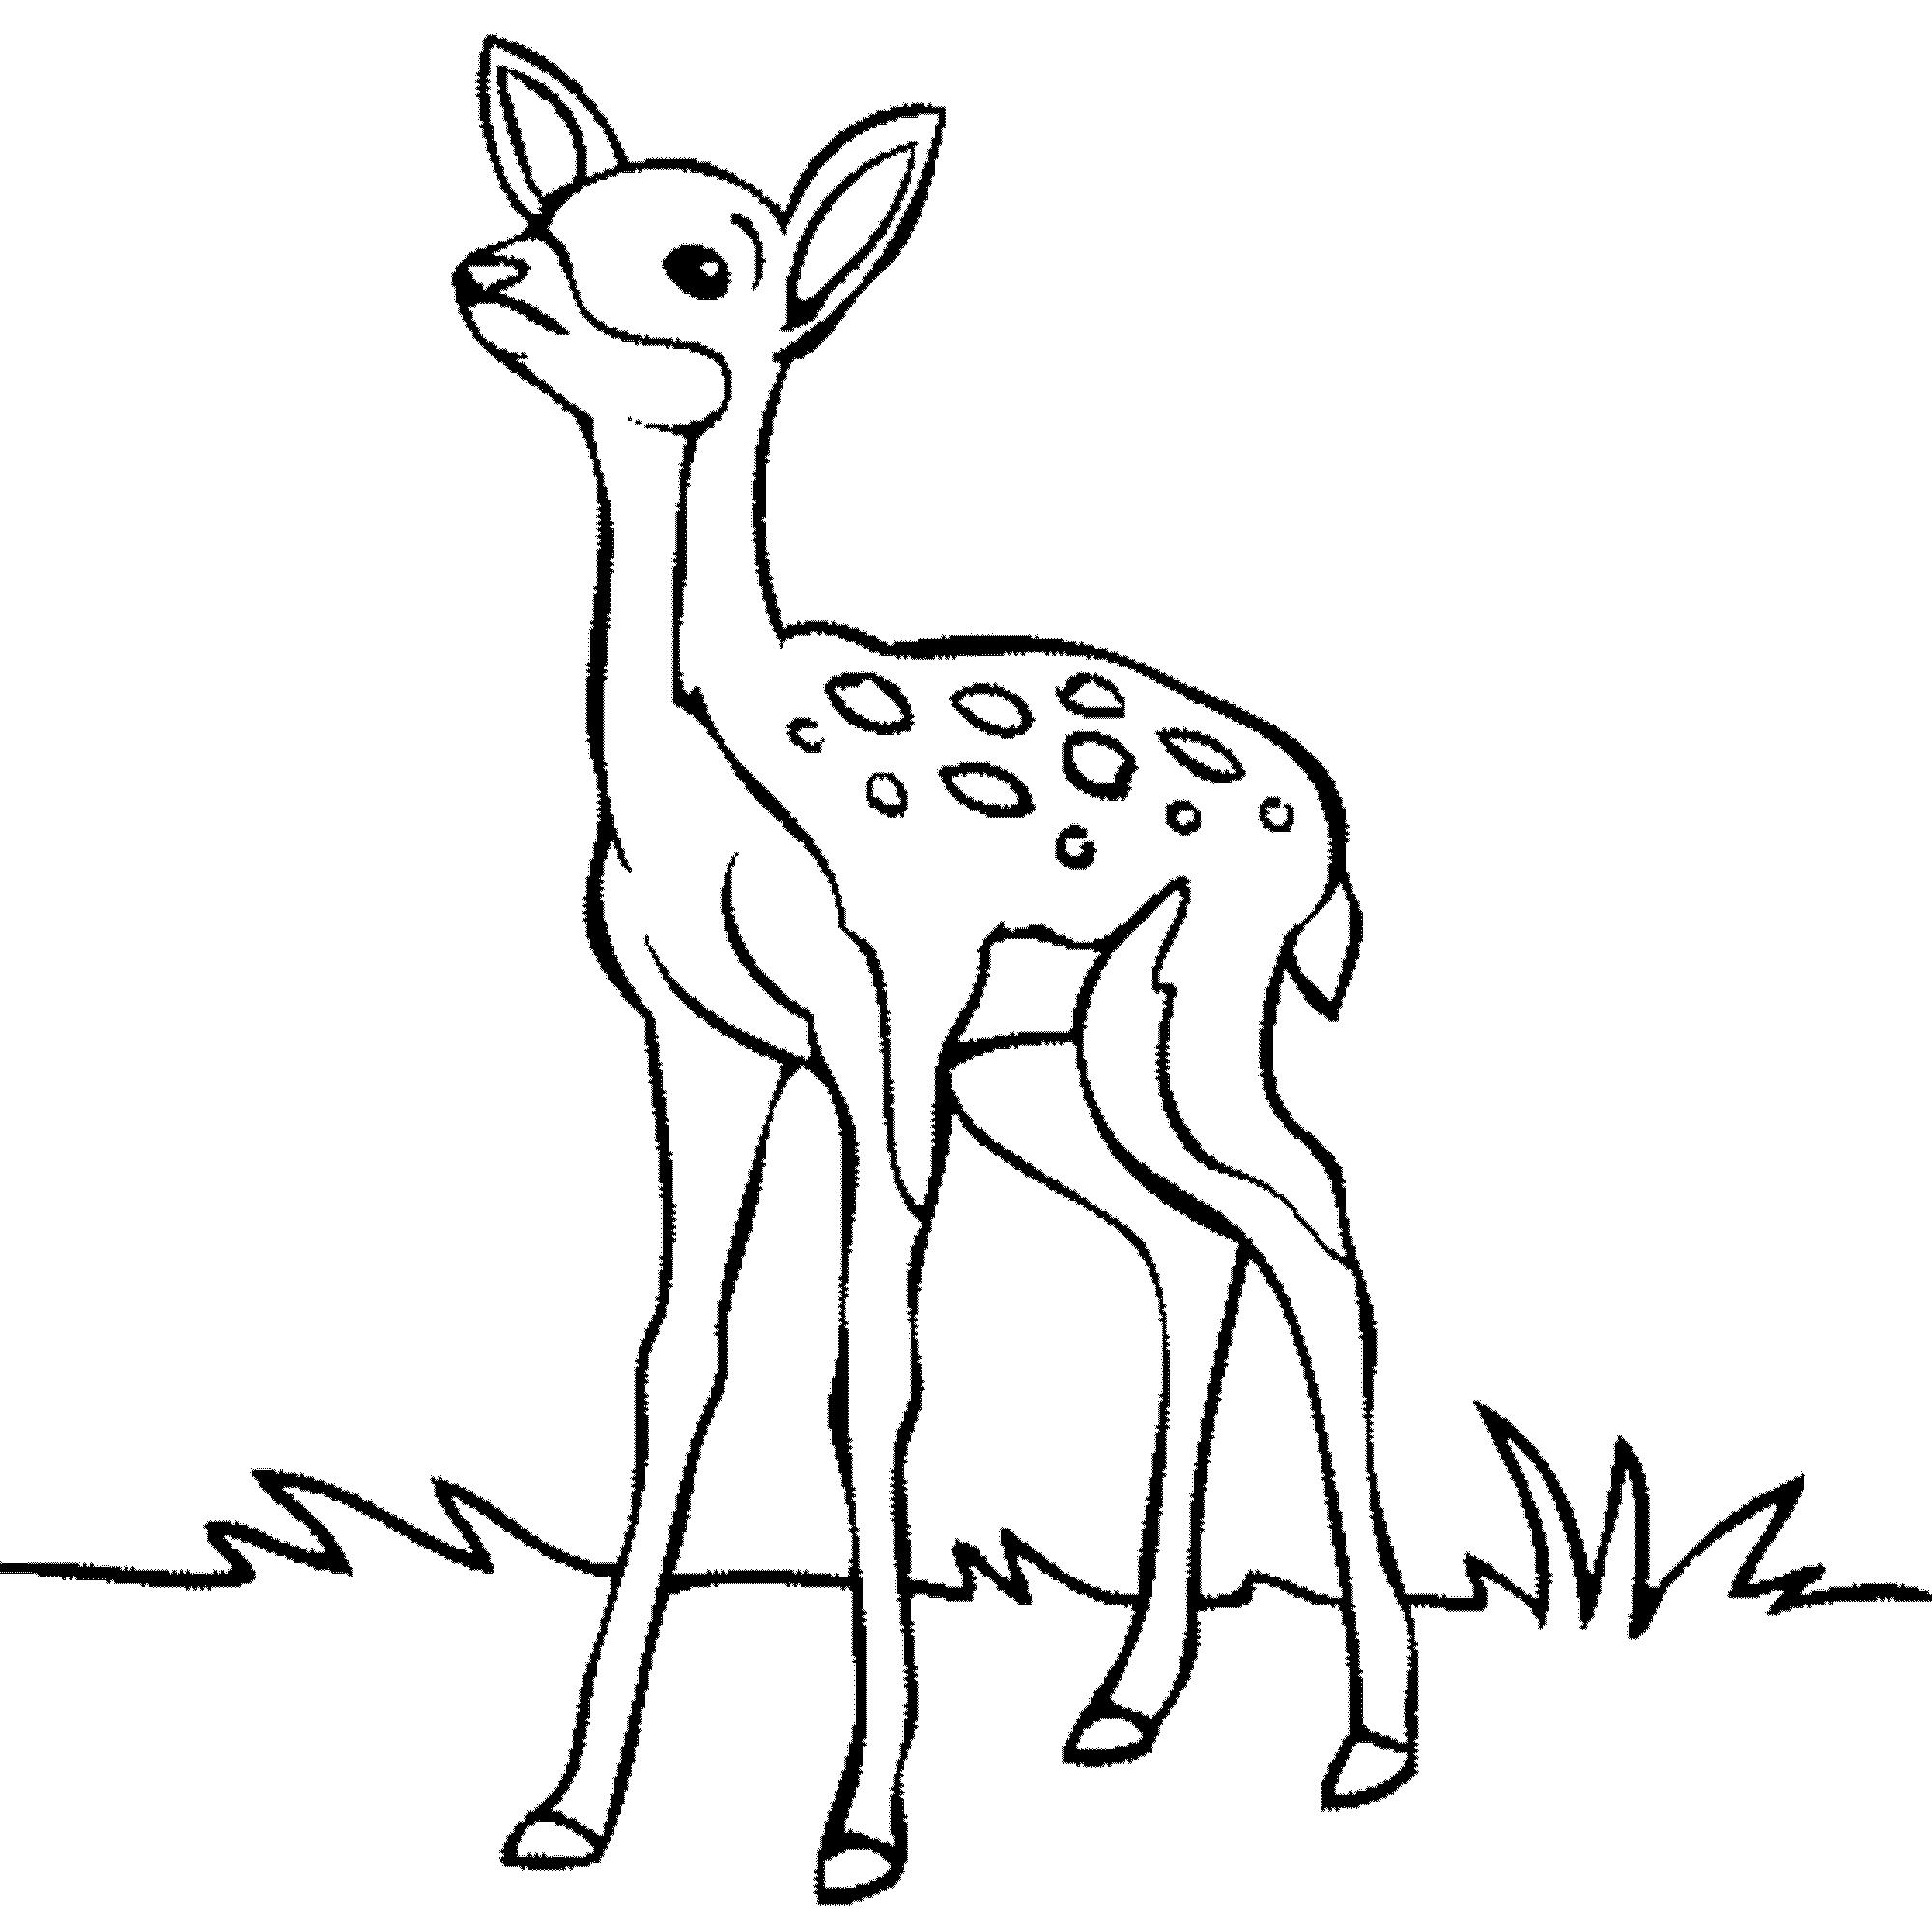 coloring book deer print download deer coloring pages for totally book coloring deer